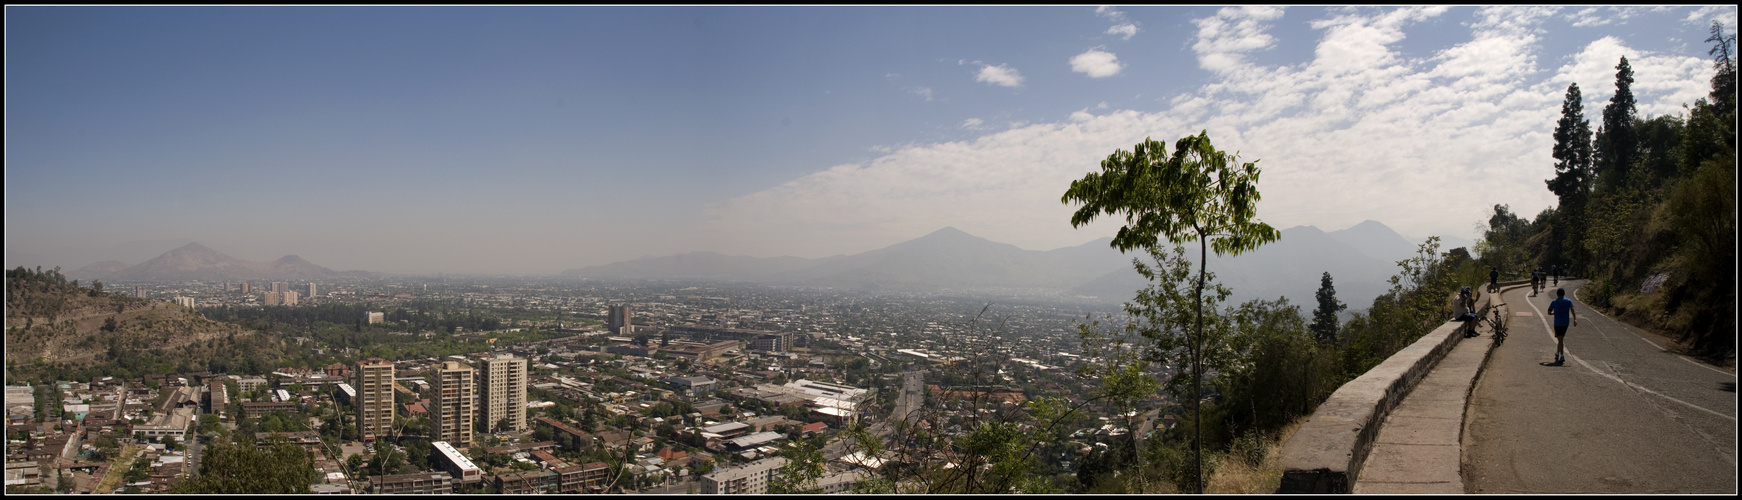 San Christobal, Santiago de Chile